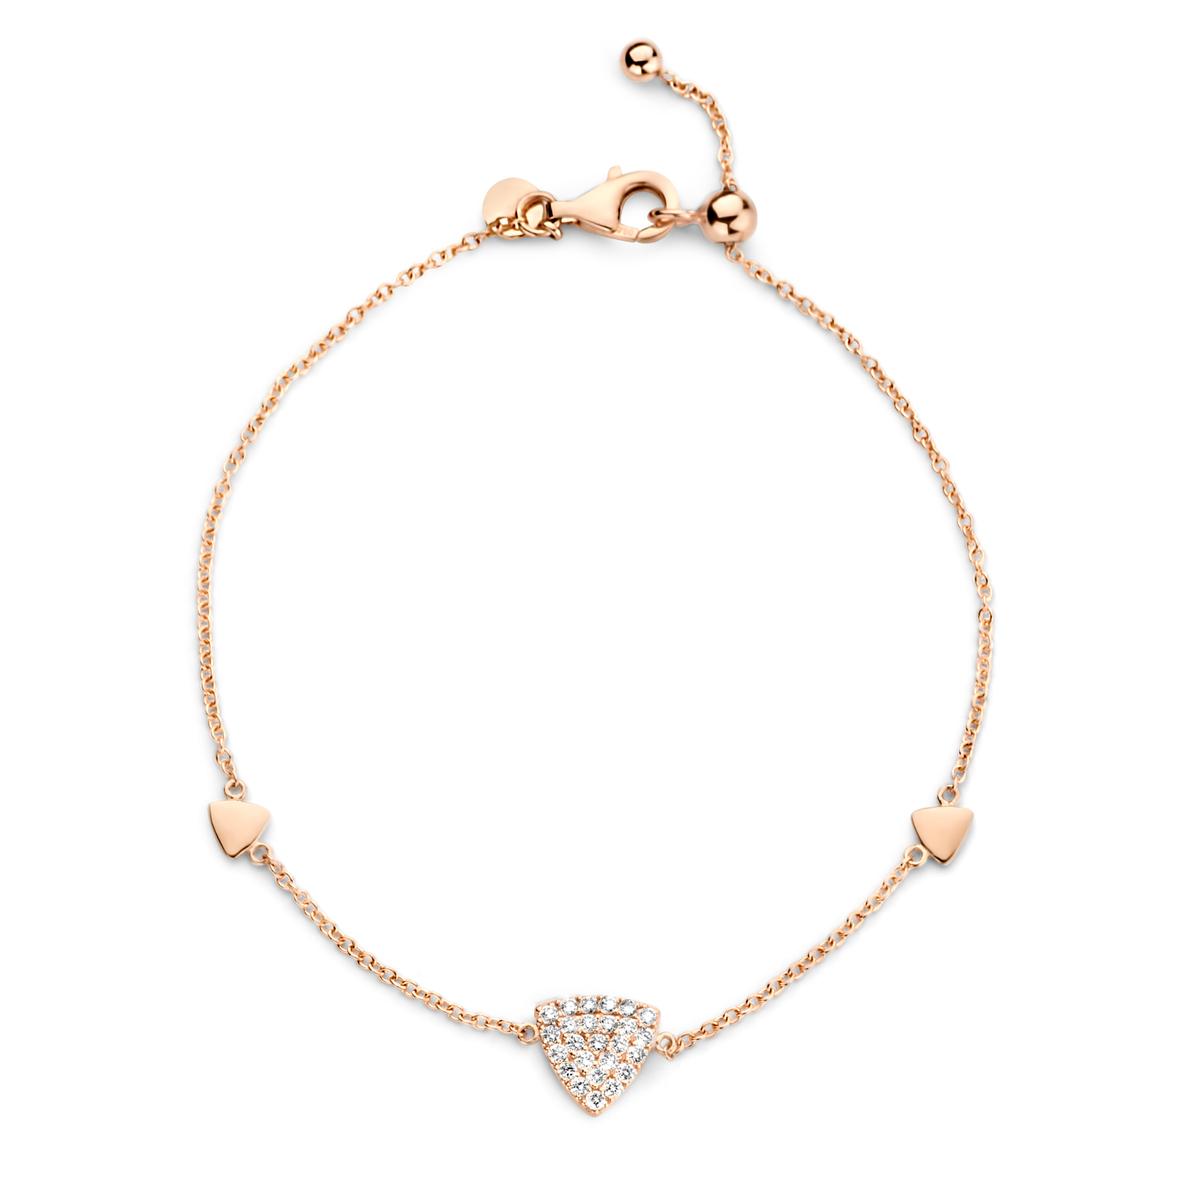 eolo bracelet in rose gold